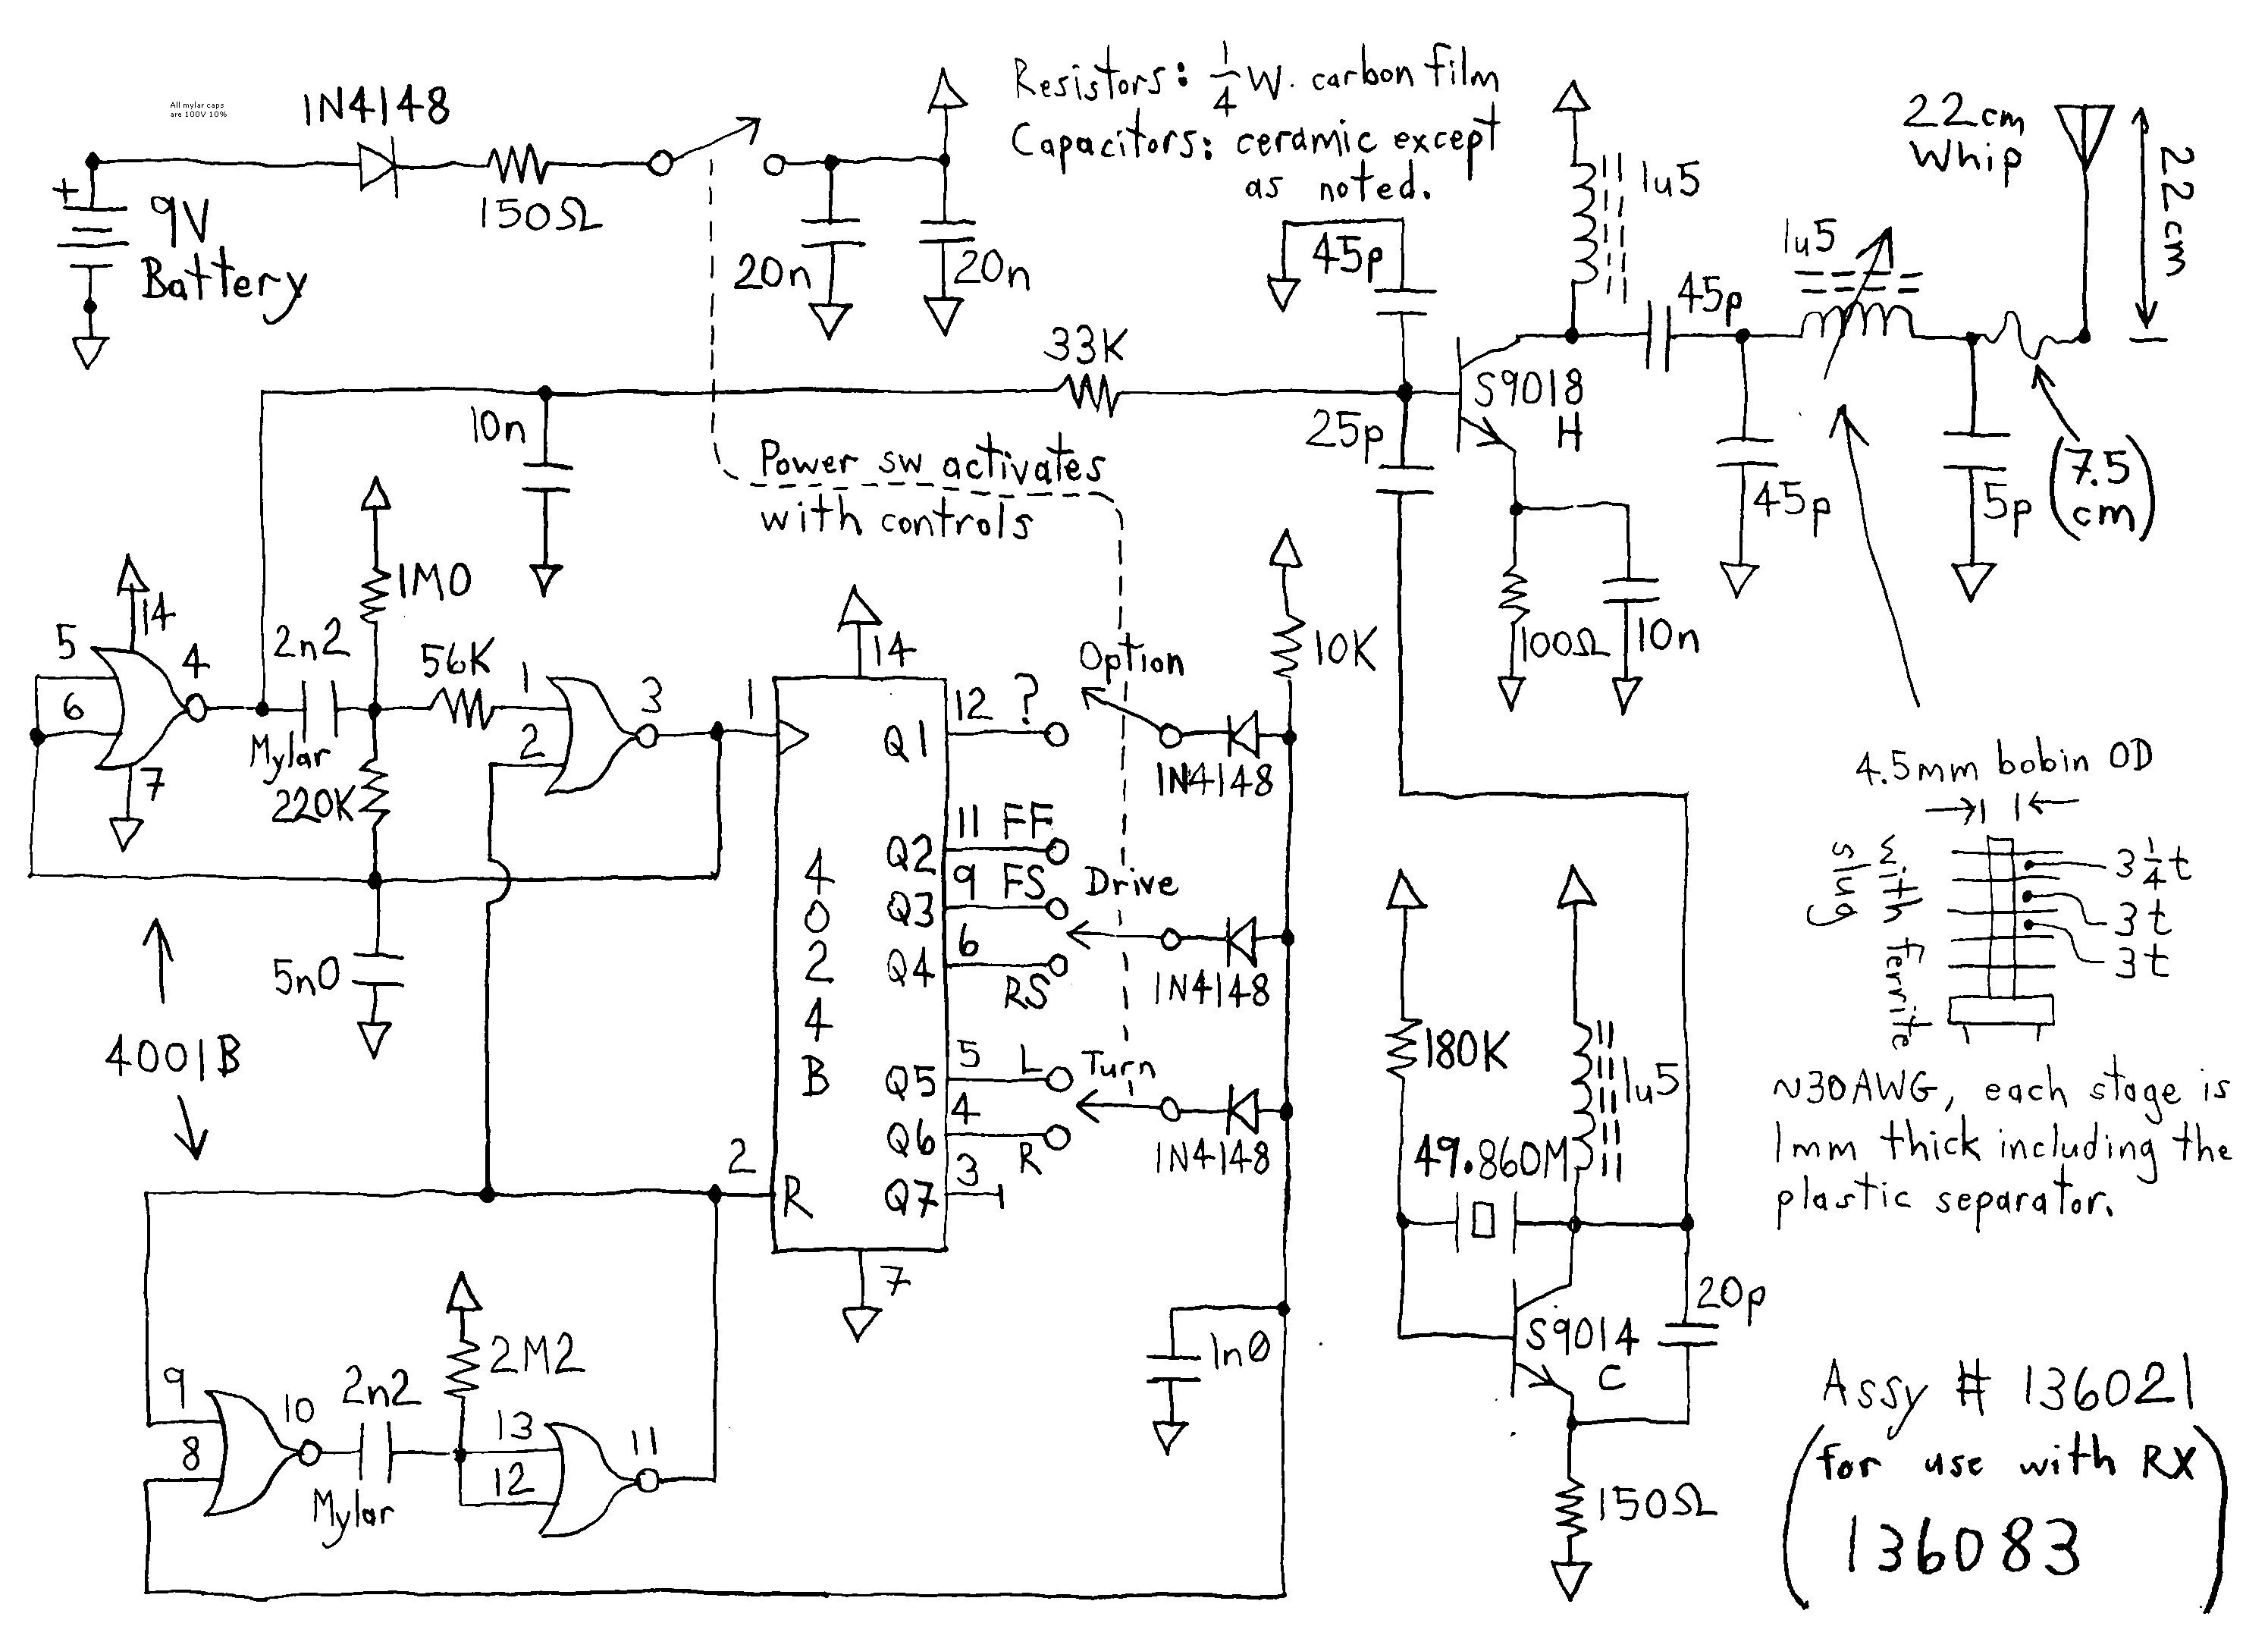 General Electric Motor Wiring Diagram General Electric Motor Wiring Diagram Shahsramblings Of General Electric Motor Wiring Diagram